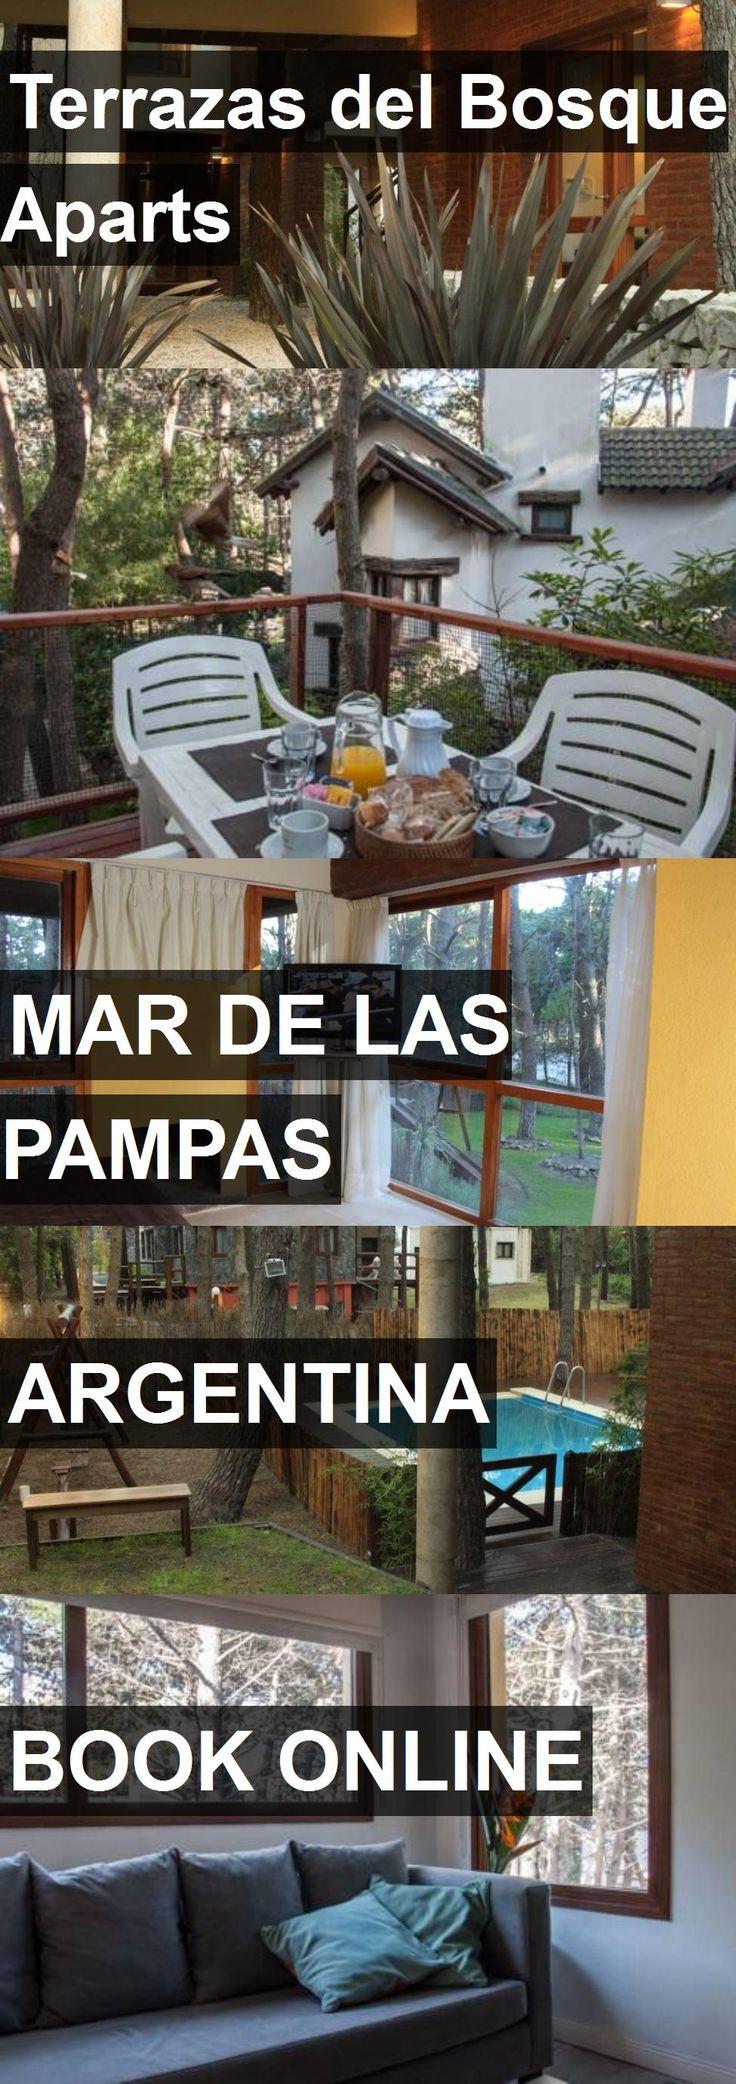 Hotel Terrazas del Bosque Aparts in Mar de las Pampas, Argentina. For more information, photos, reviews and best prices please follow the link. #Argentina #MardelasPampas #hotel #travel #vacation